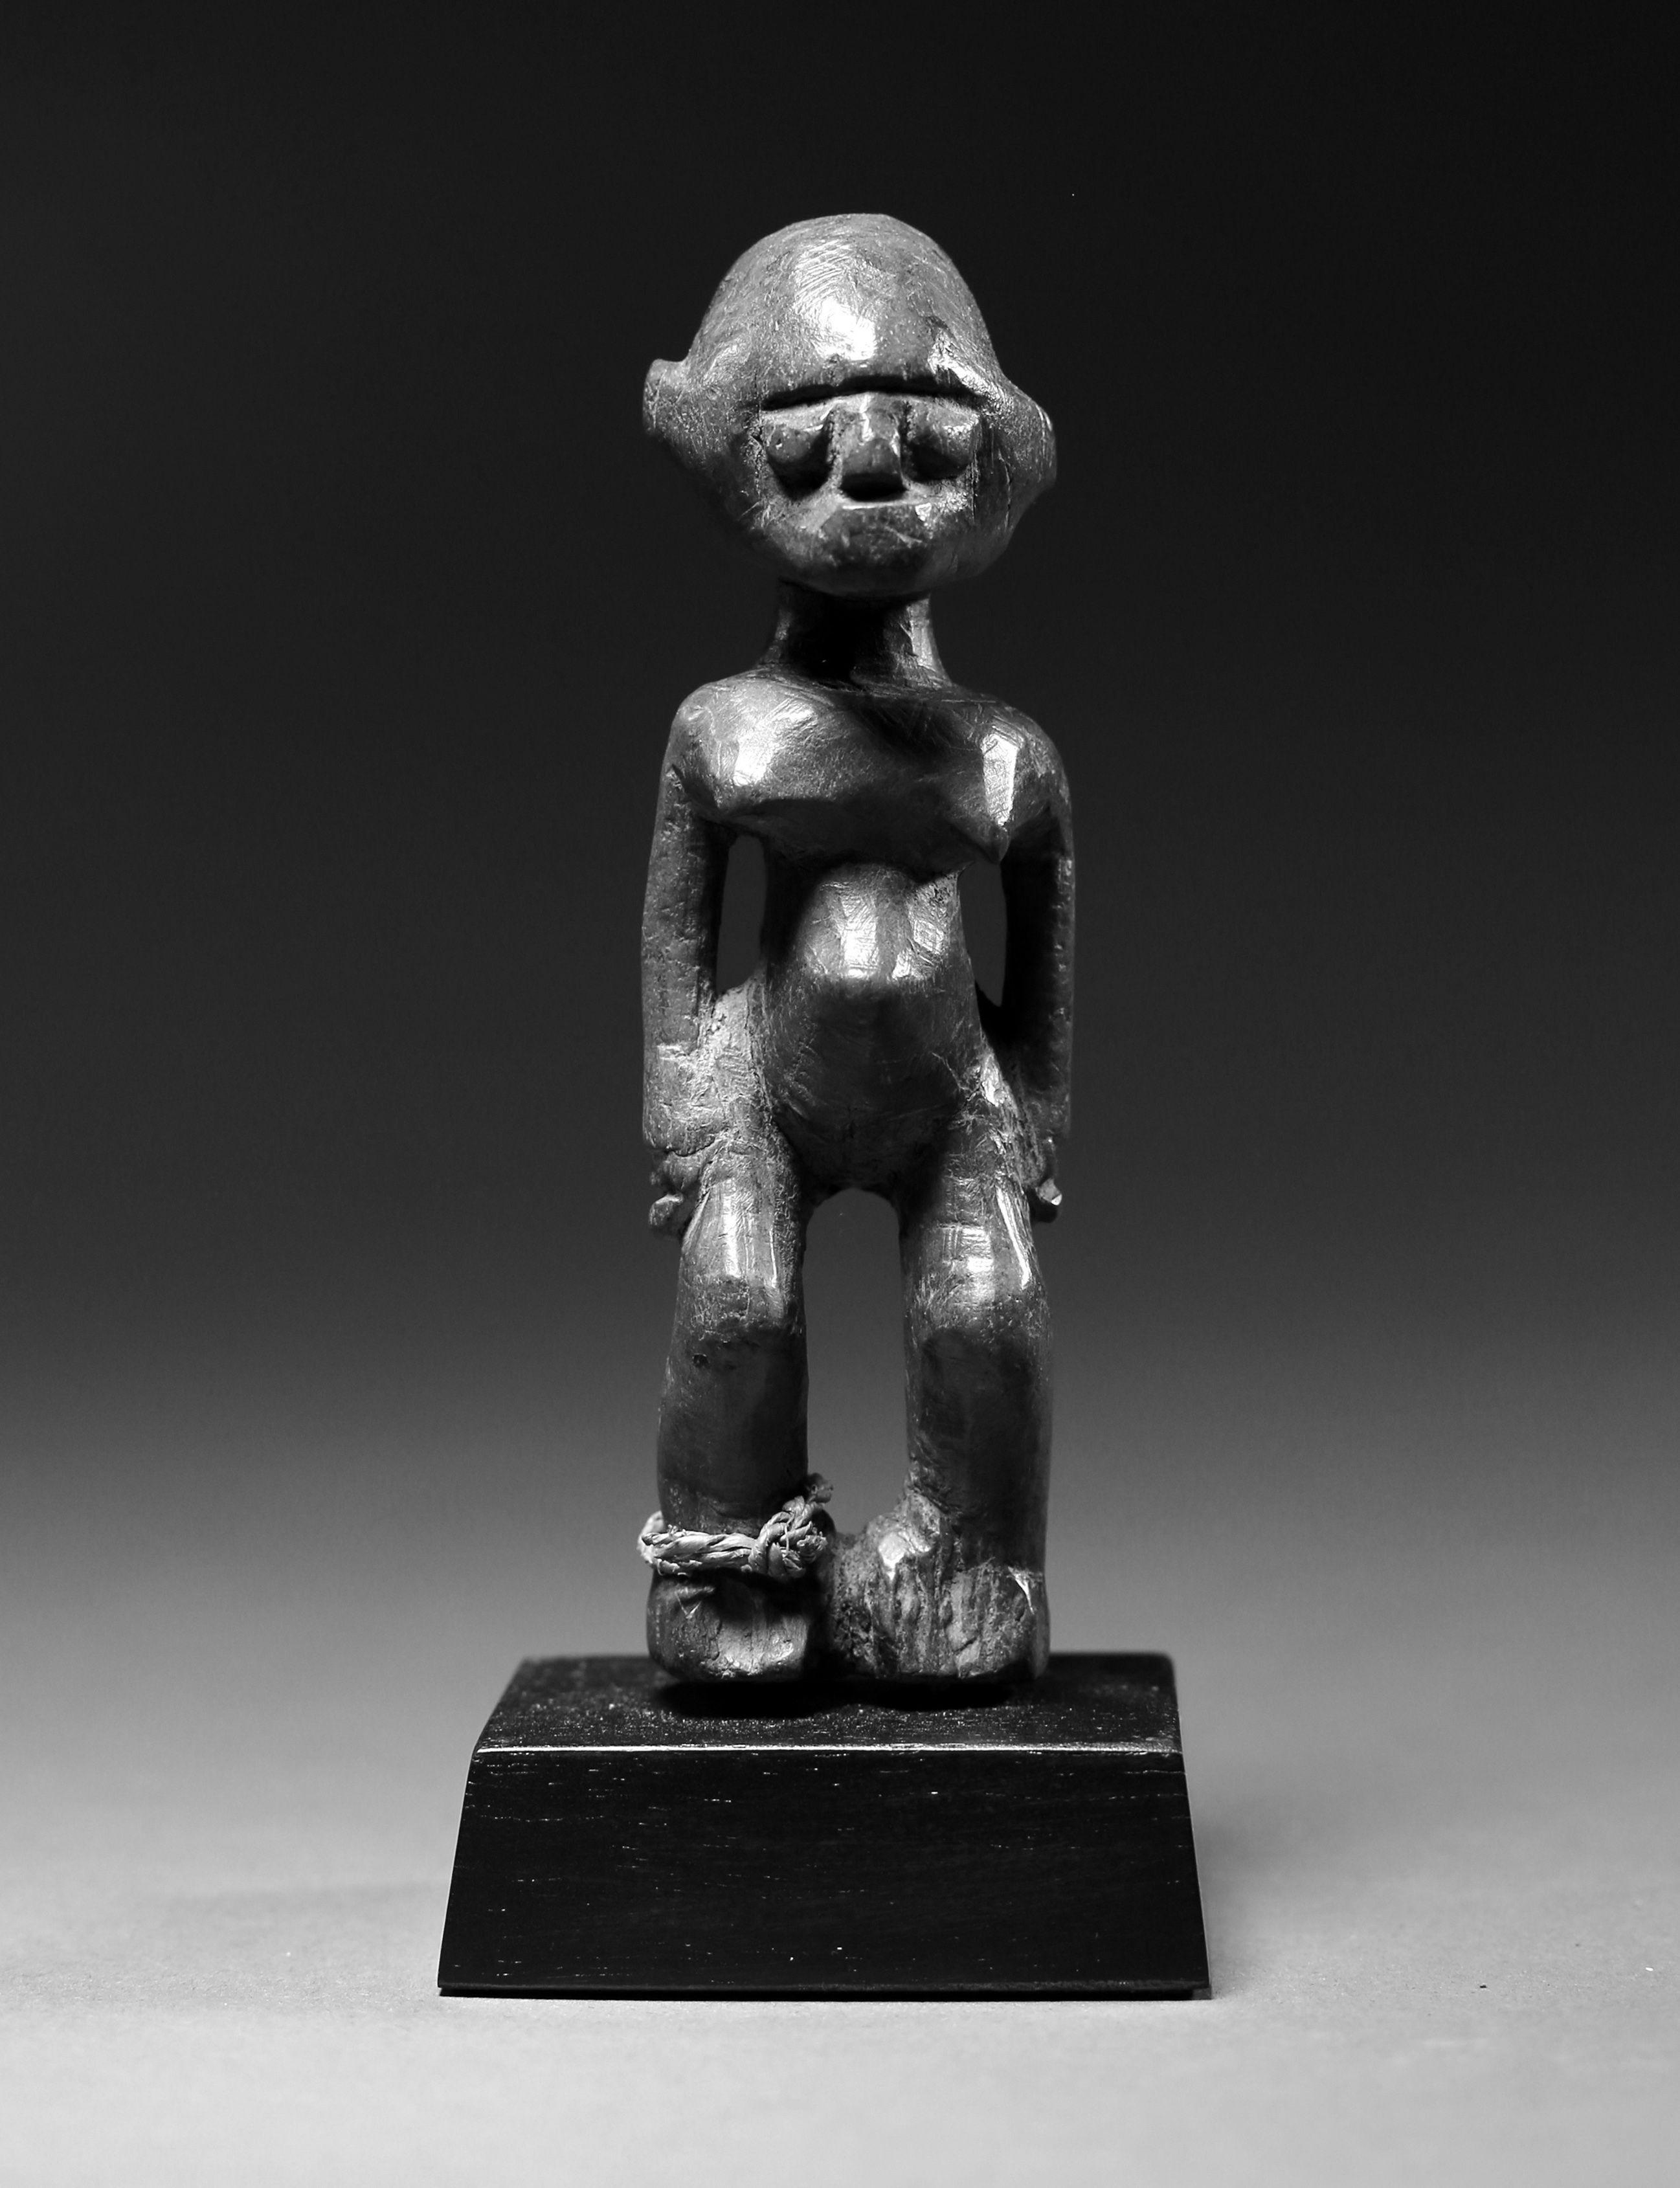 Lobi-statue, 13cm.  Photo © Niklas Herkenhoff.